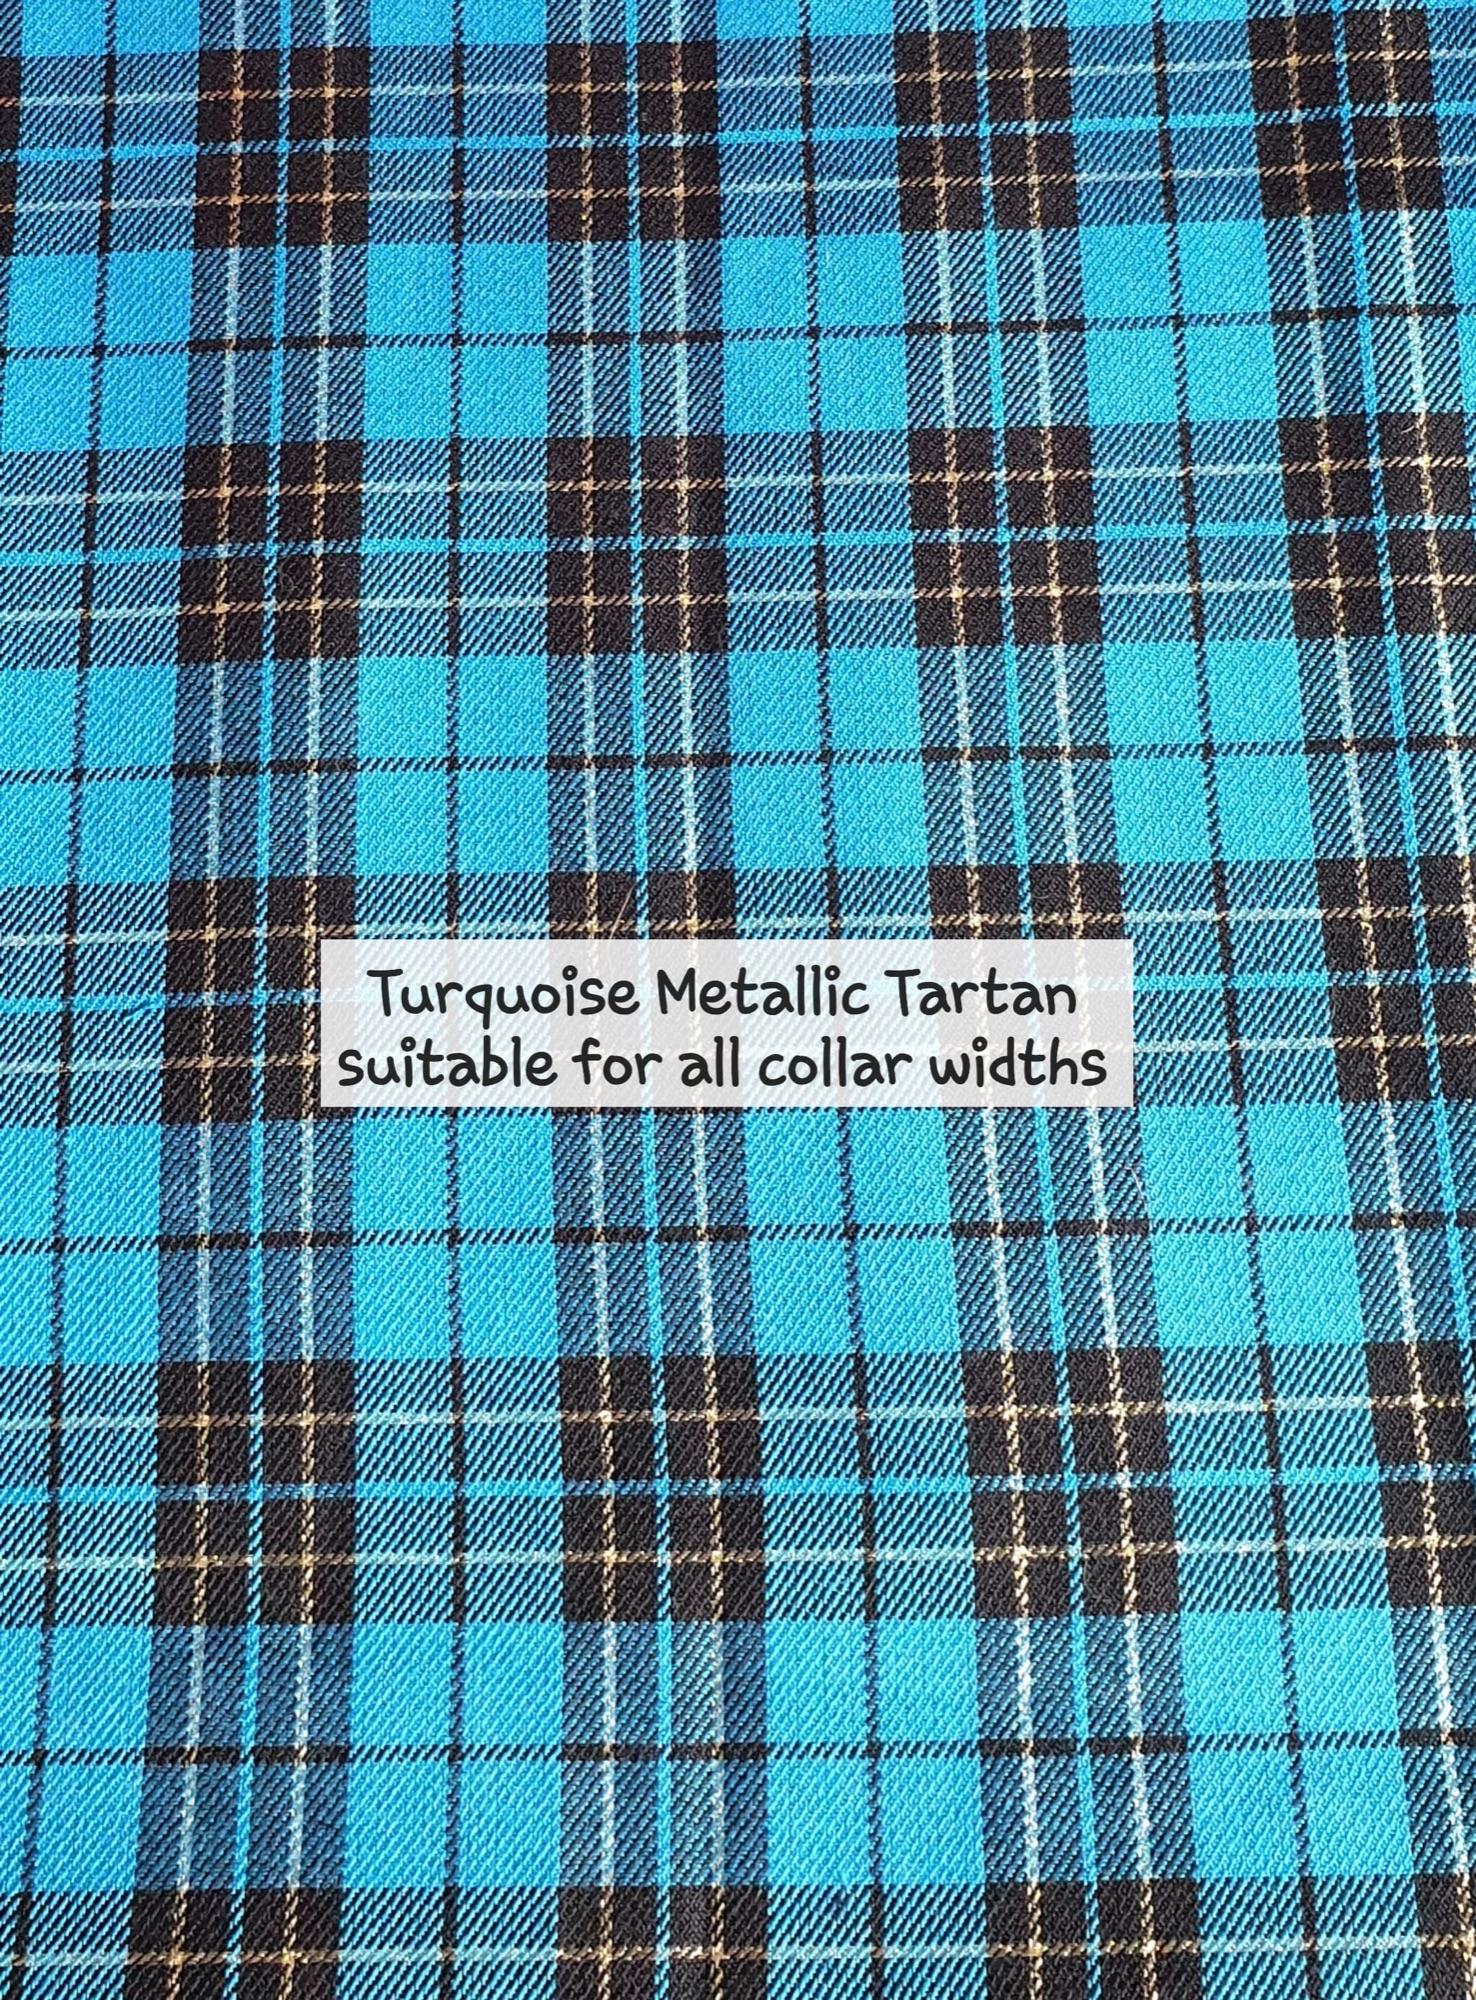 Turquoise Metallic Tartan